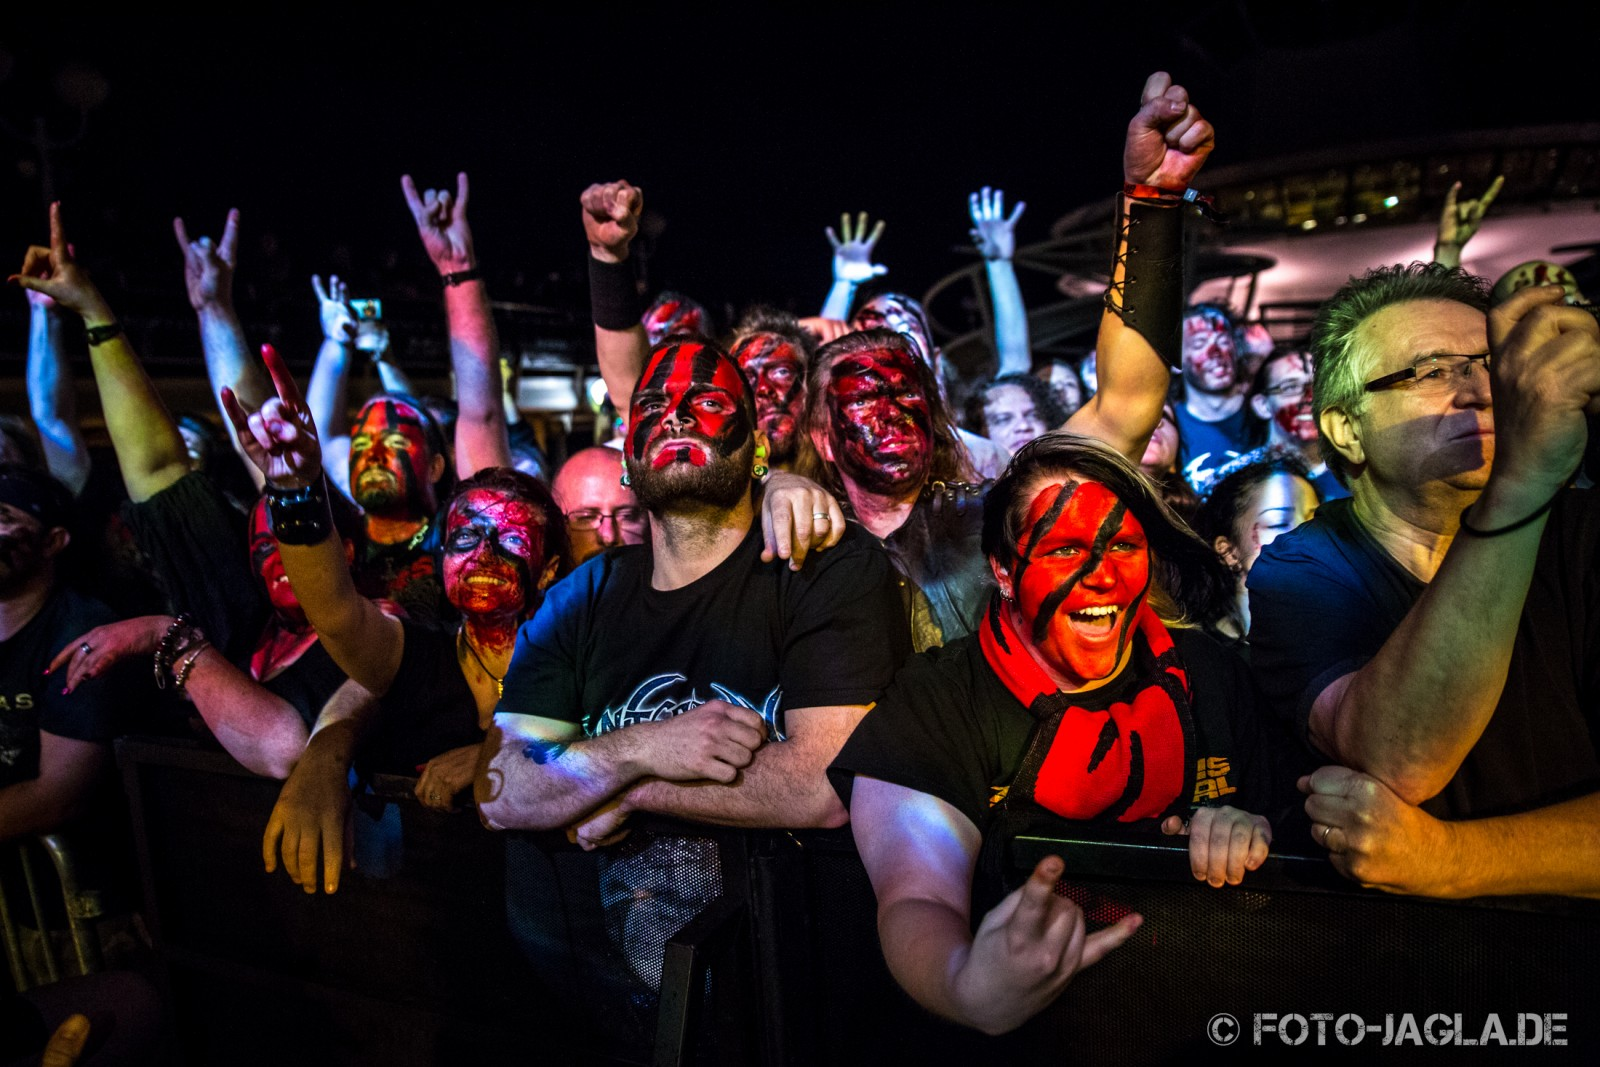 70000 Tons of Metal 2013 ::. Crowd @ Turisas ::. http://www.foto-jagla.de